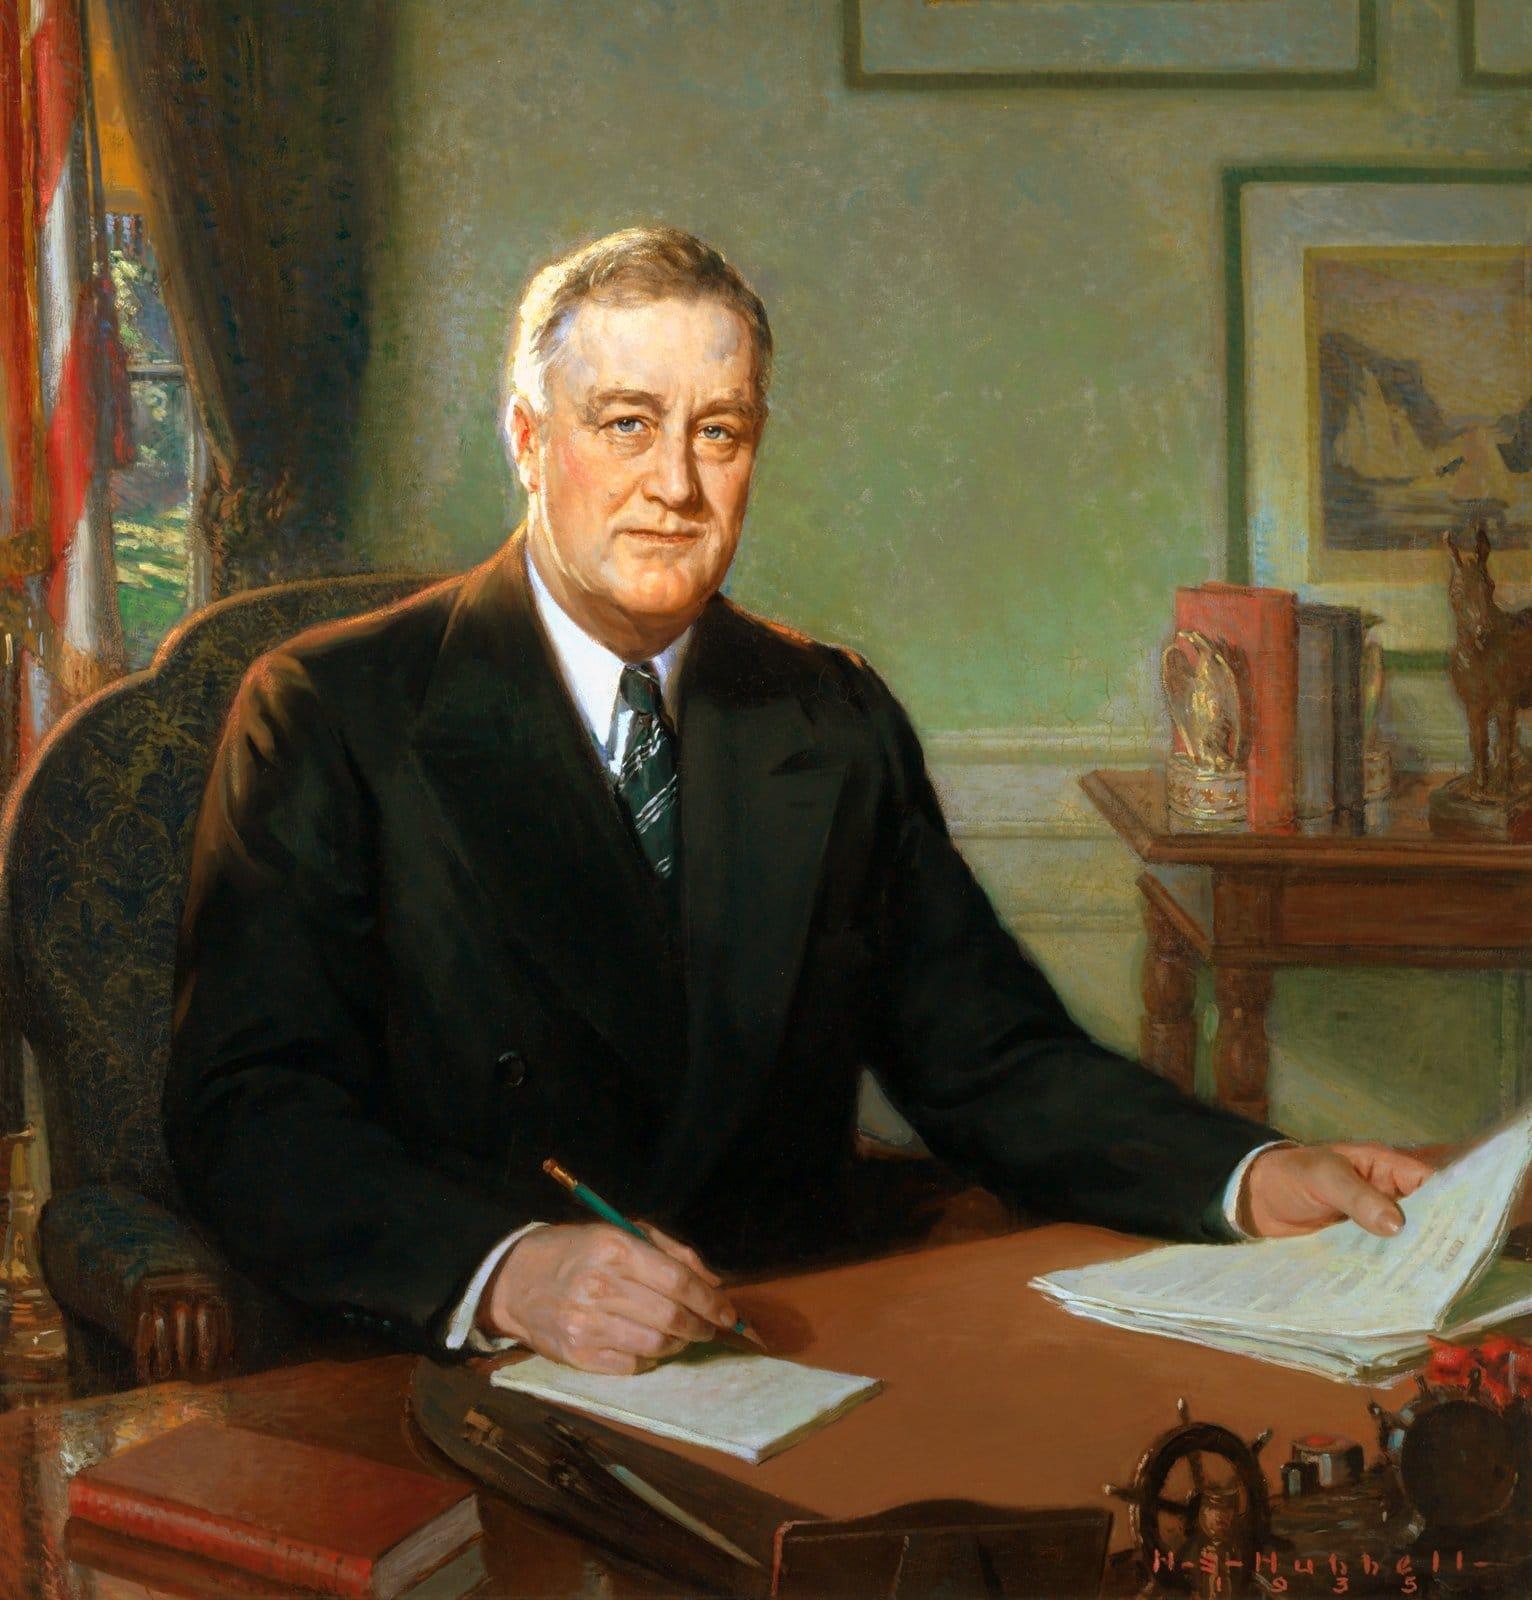 Painted portrait of President Franklin Delano Roosevelt